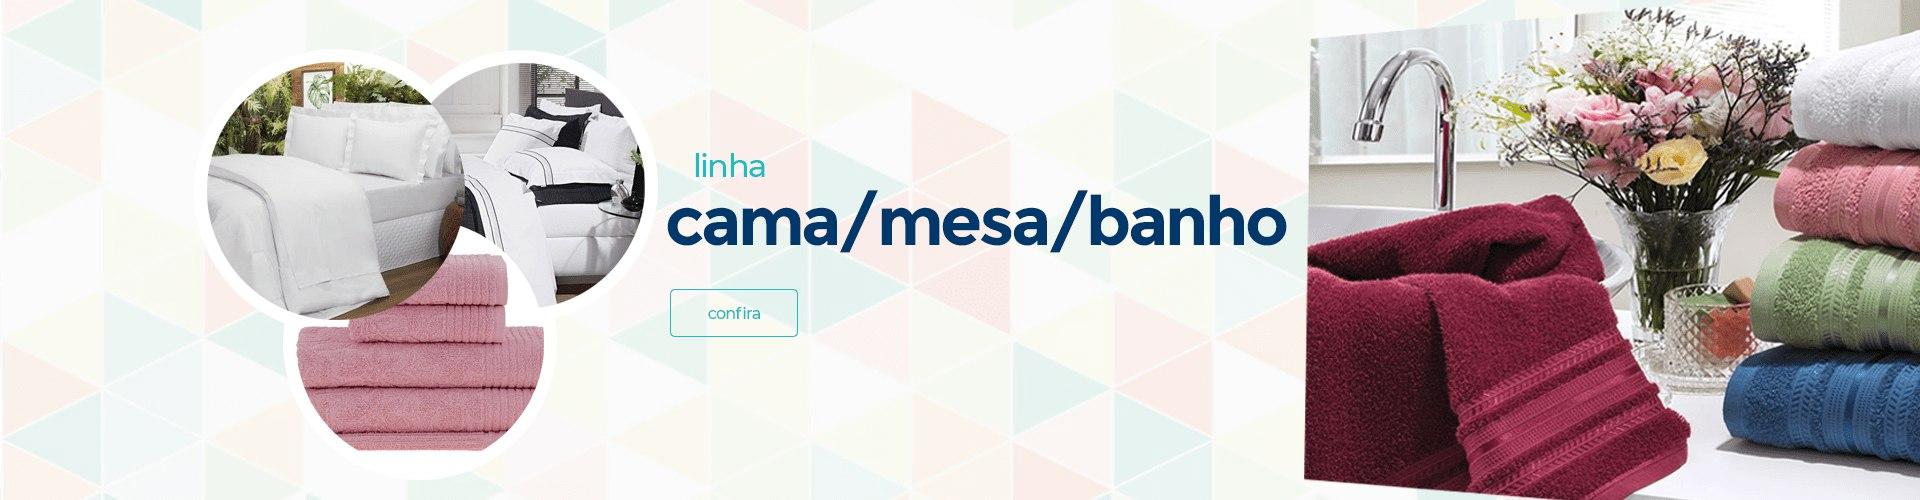 FullBanner_CamaMesaBanho